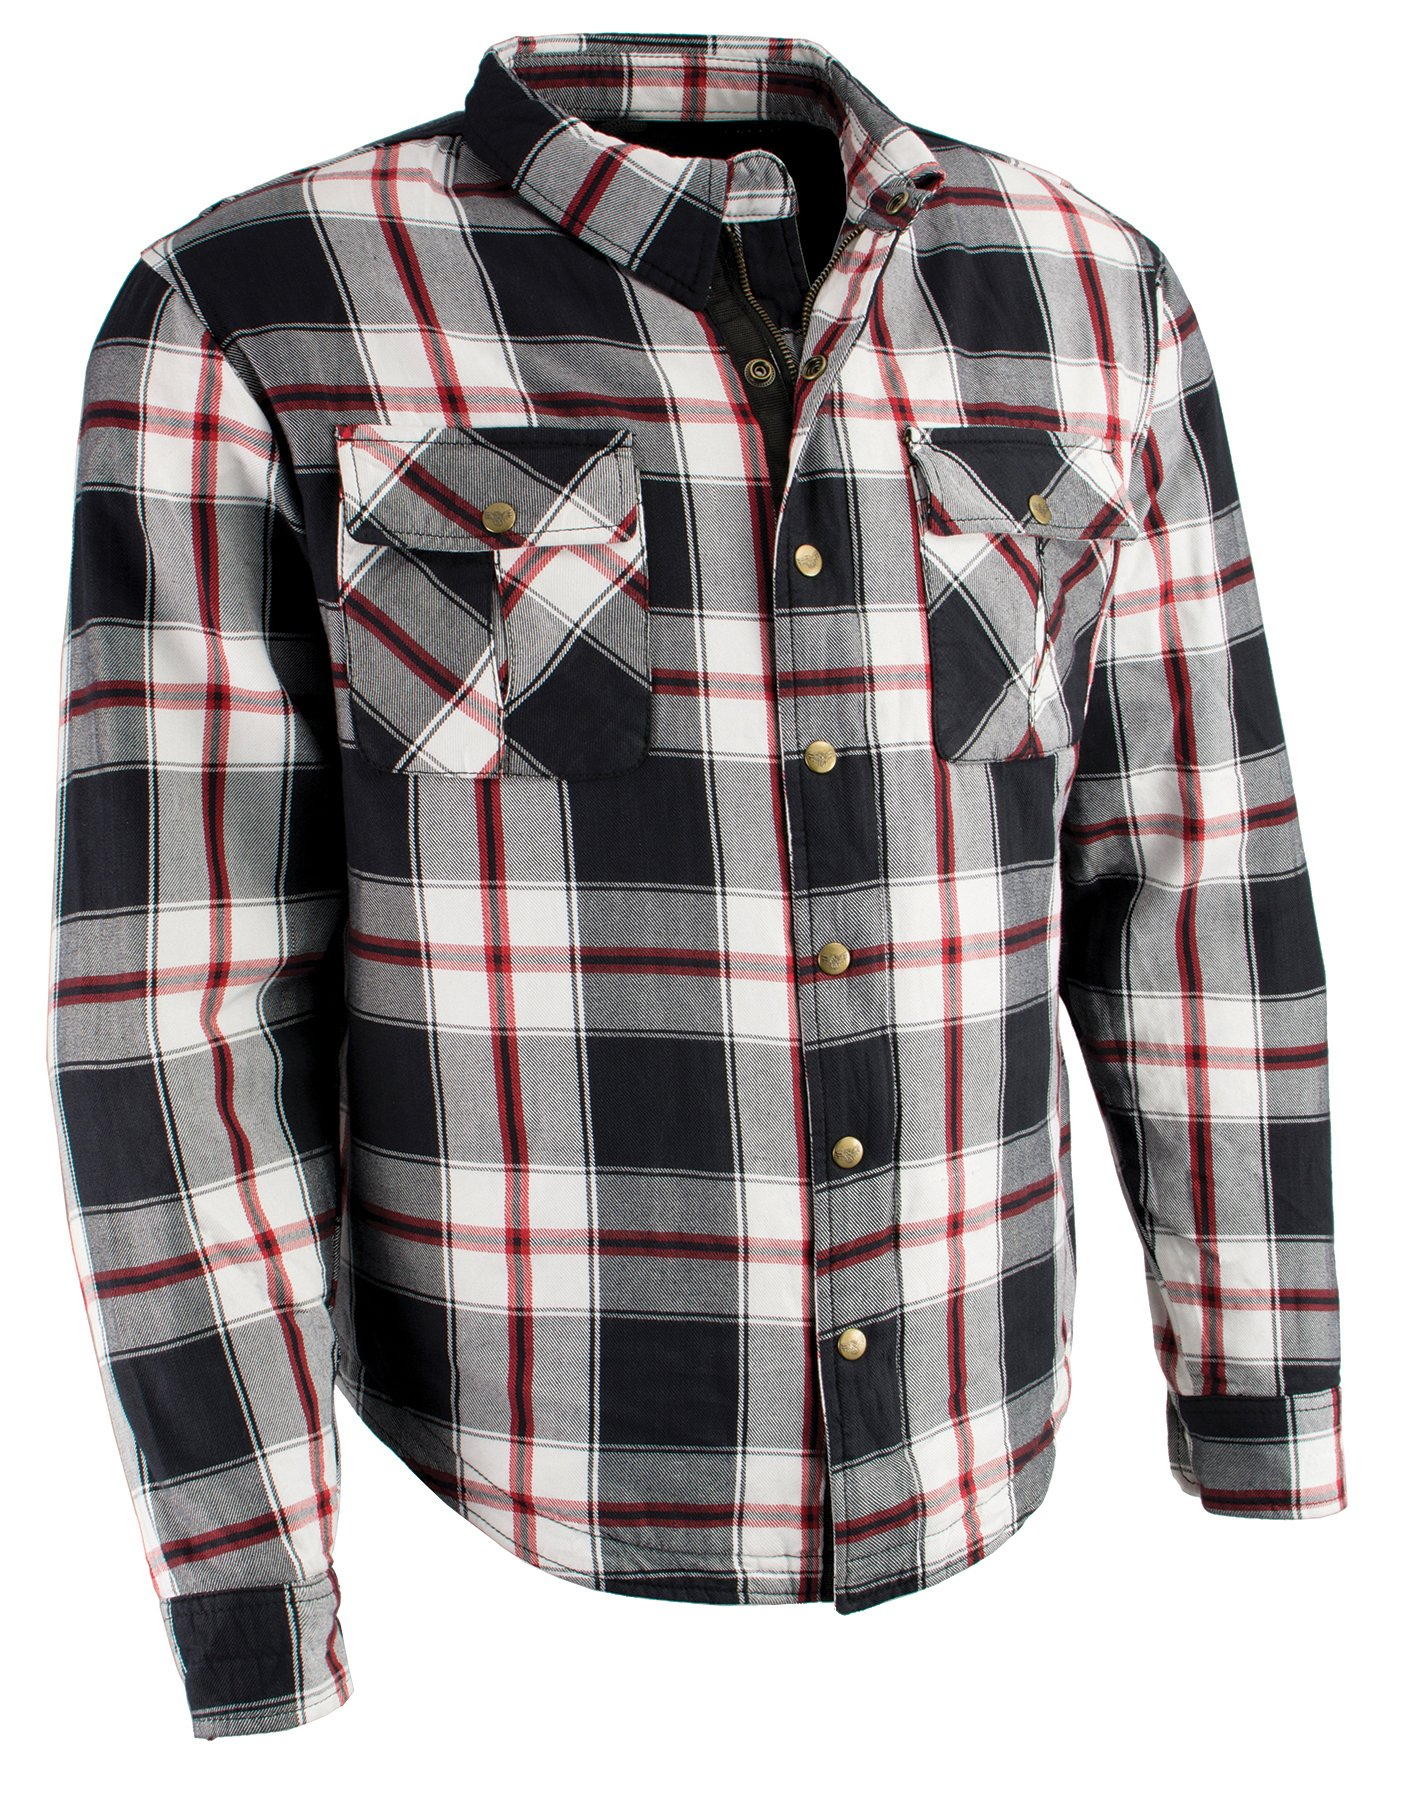 Milwaukee Performance Men's Flannel Biker Shirt with Aramid (Black/White/Red, XL)